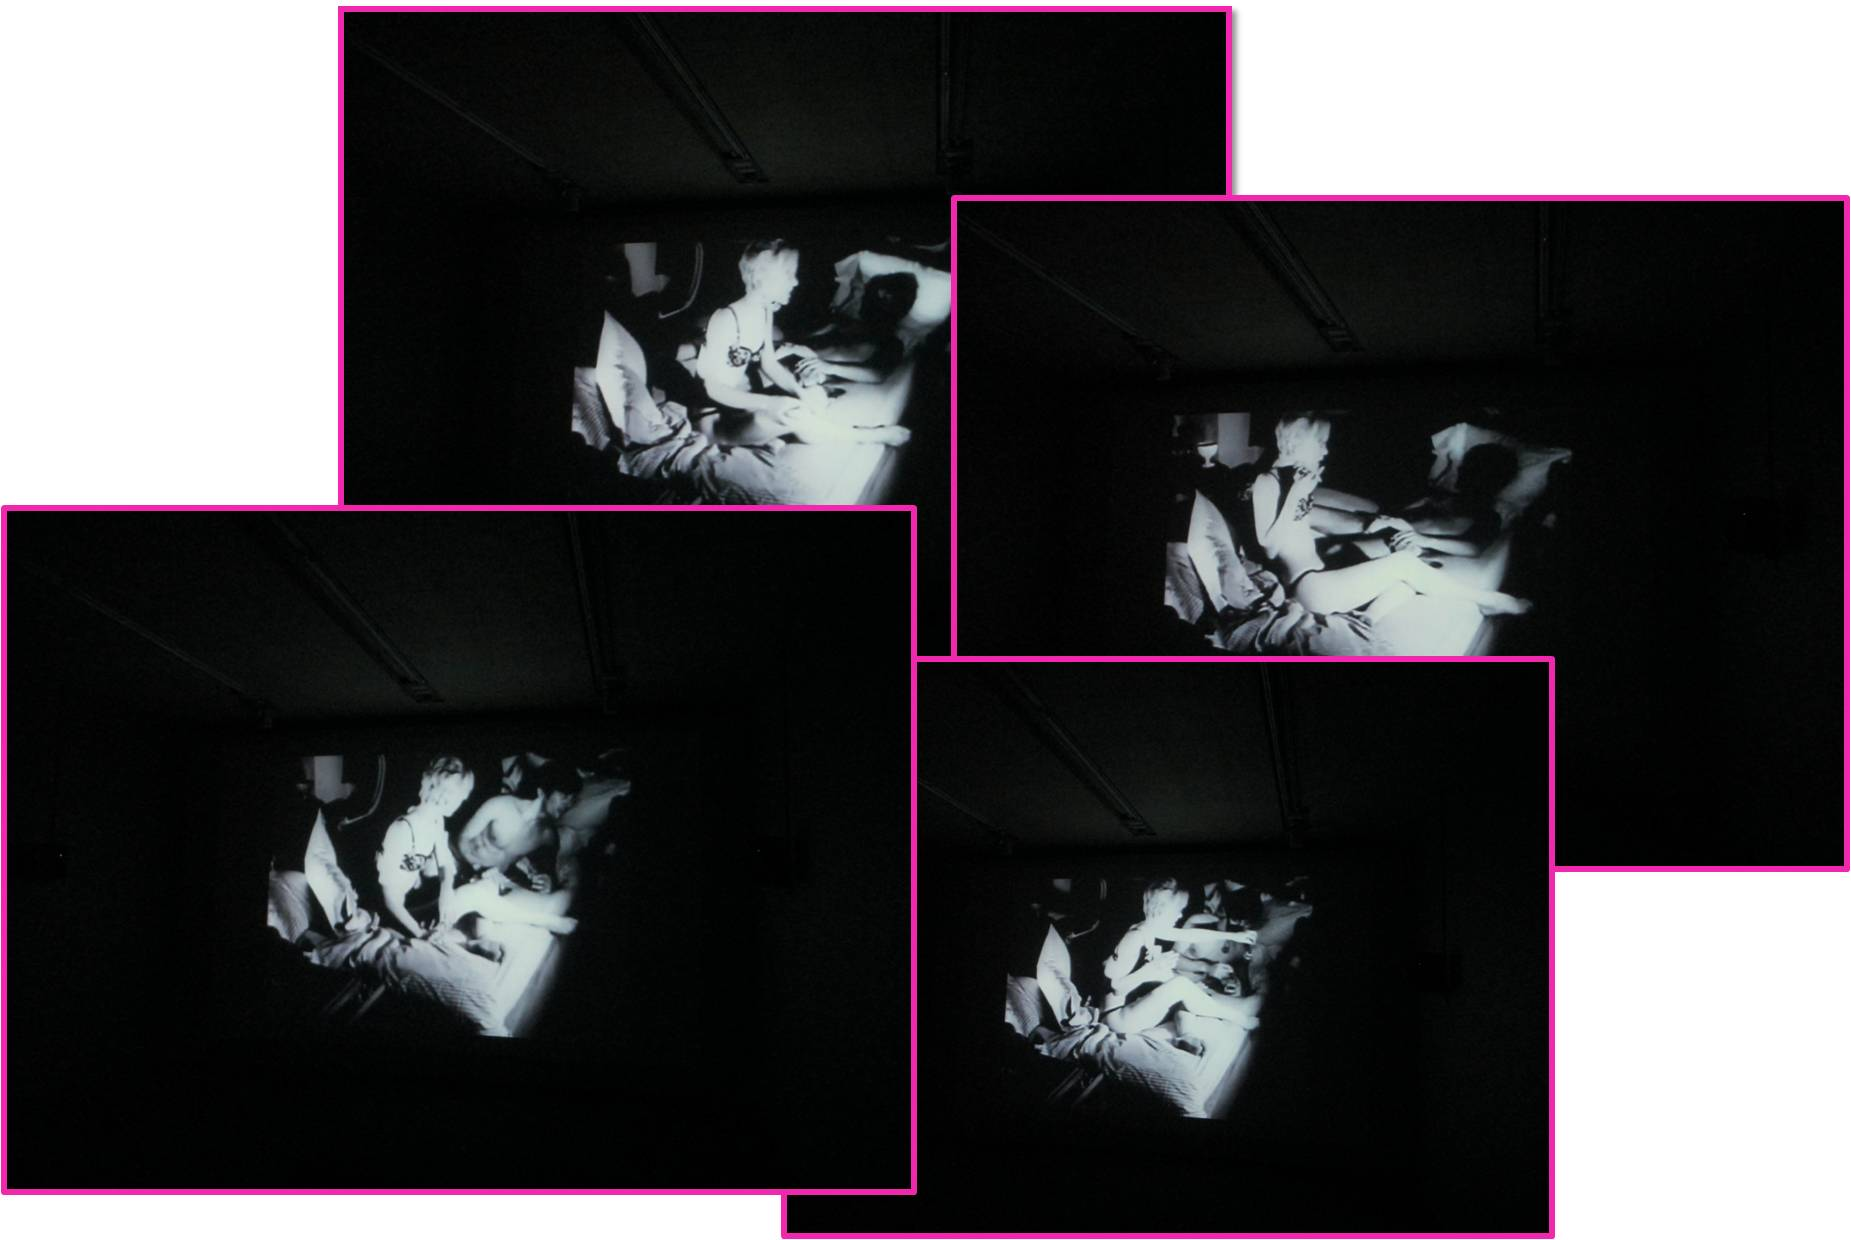 Andy Warhol Films